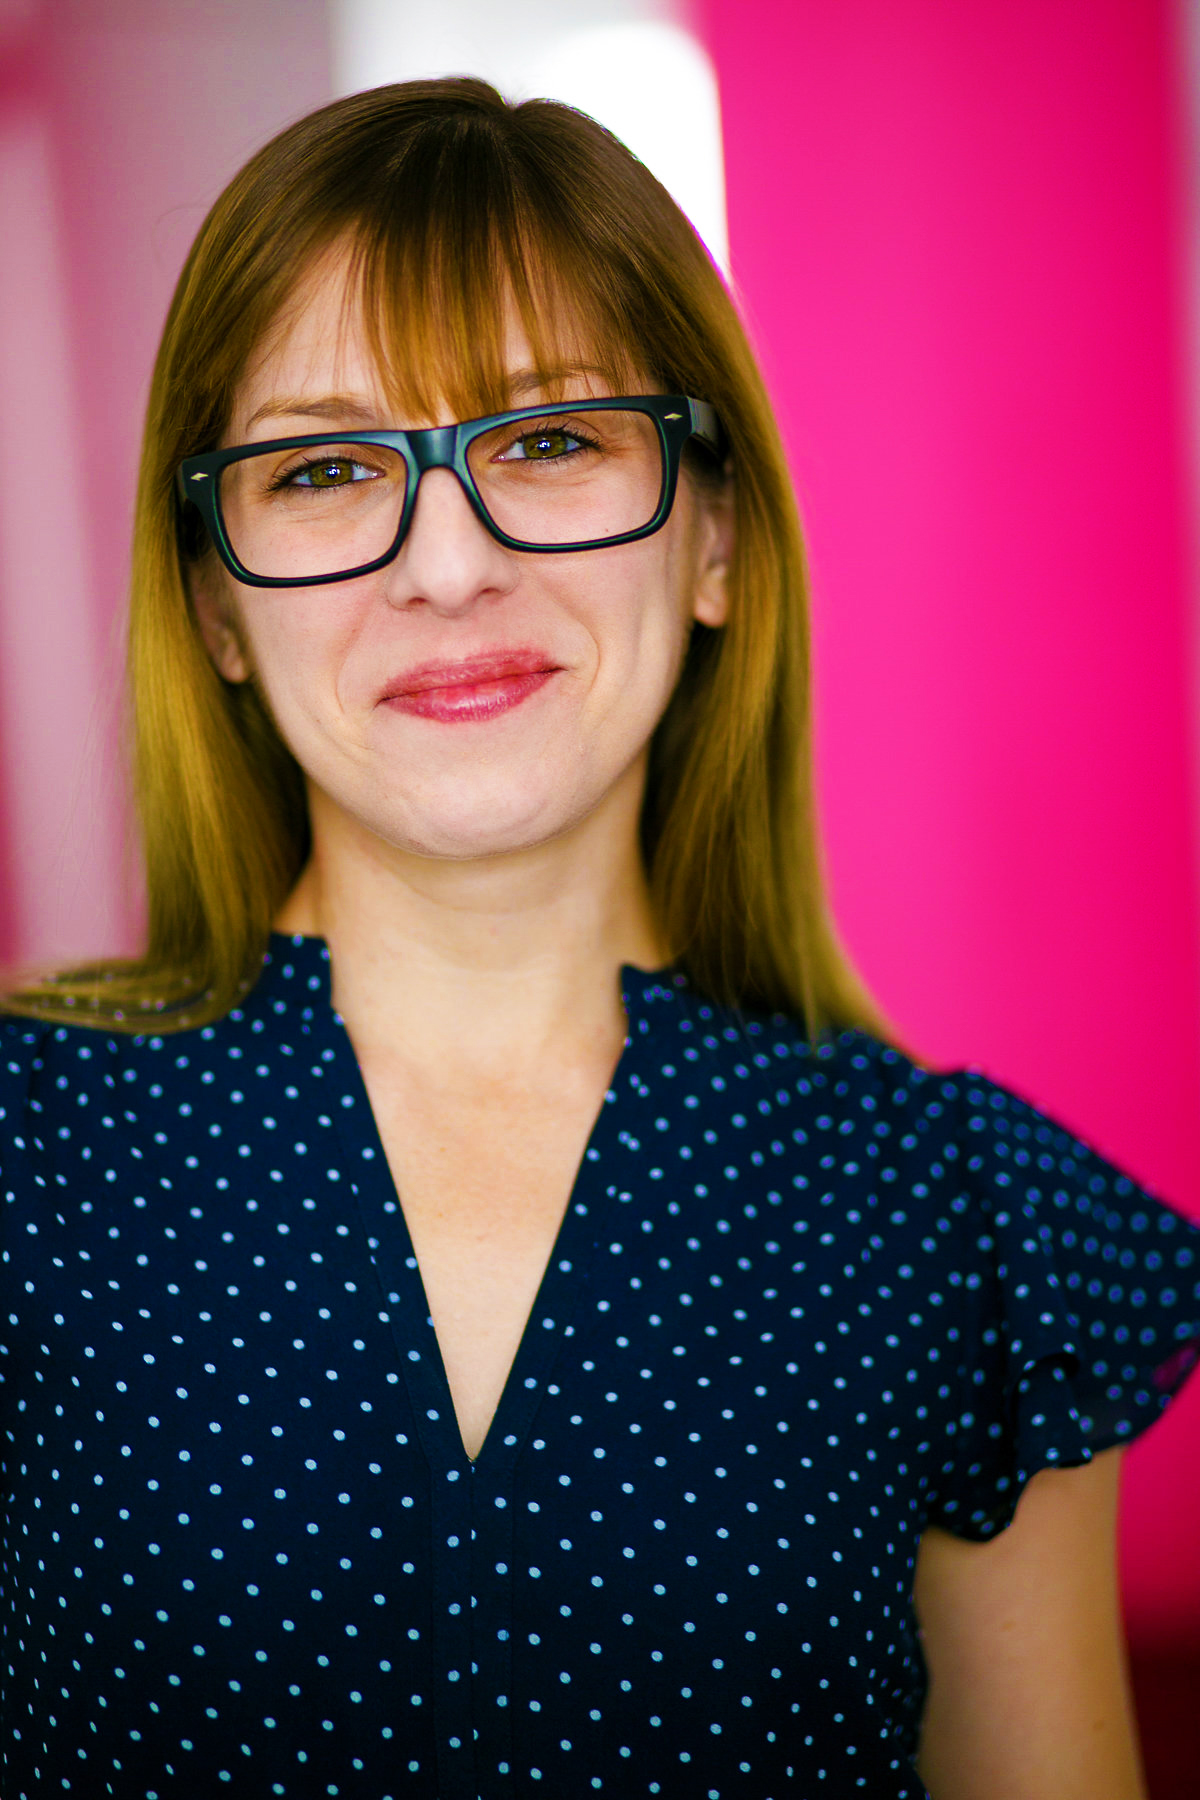 glasses pink background.jpg